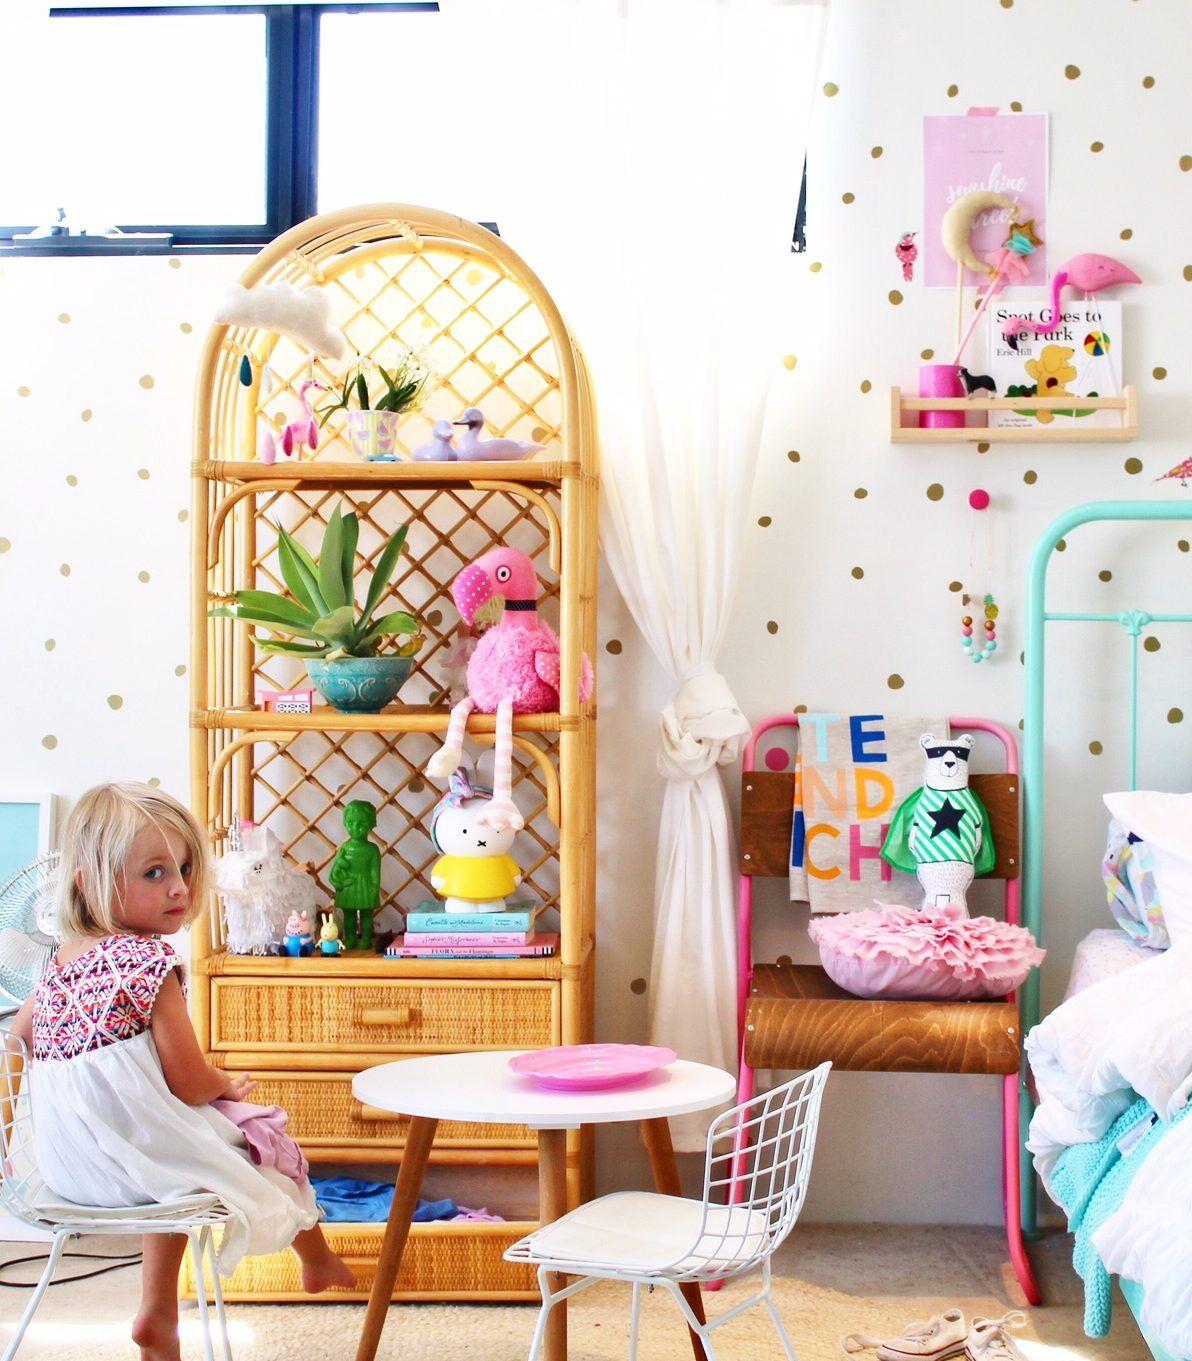 Toddler Room Ideas Bedroom For Girls Kids Kid Room Decor